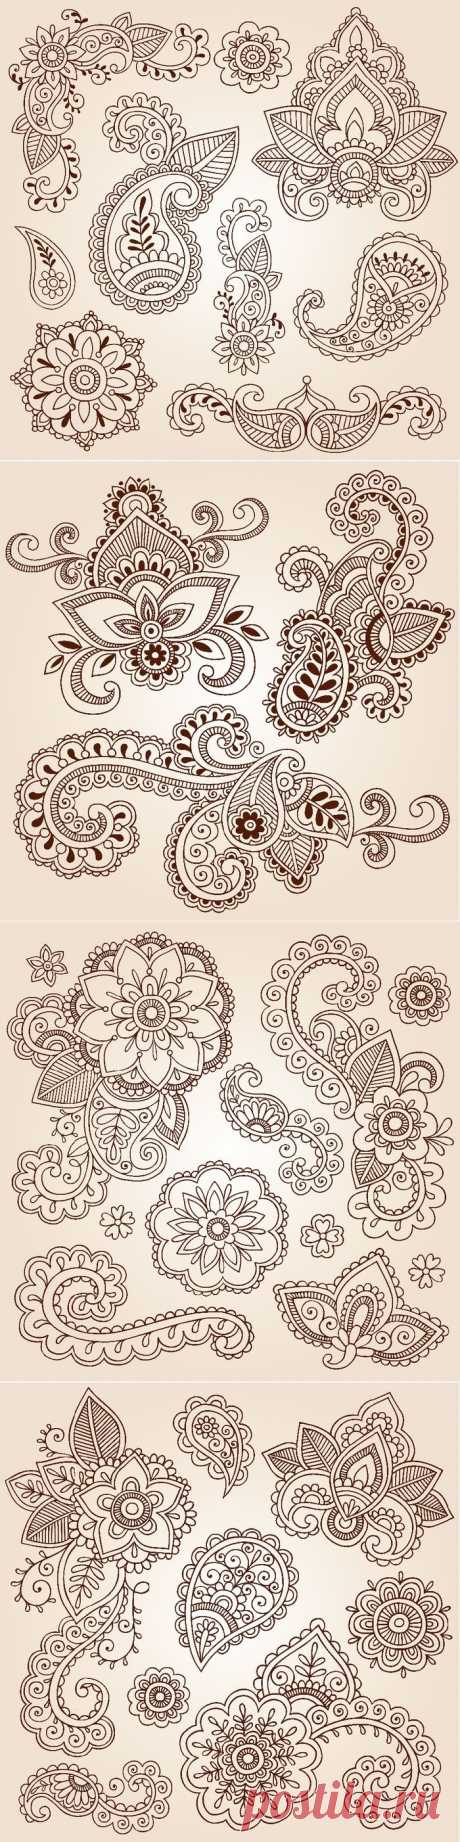 Paisley - шаблоны для росписи.